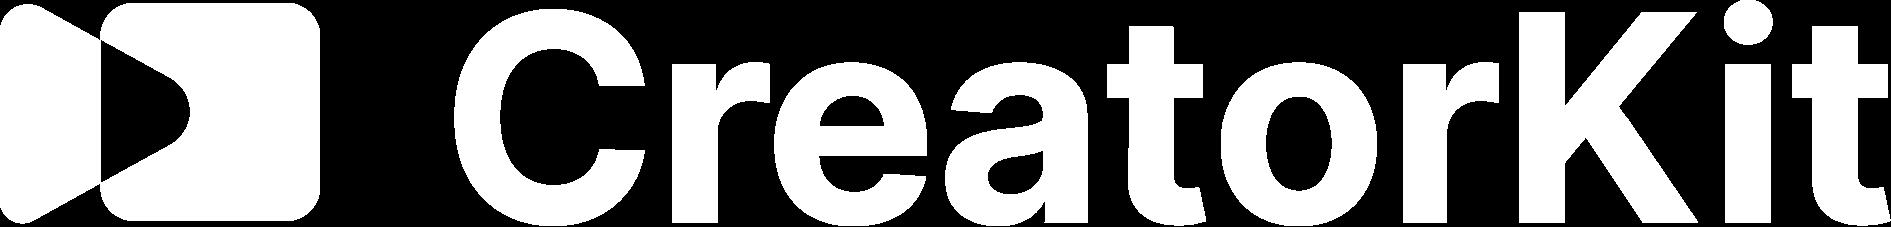 Creatorkit